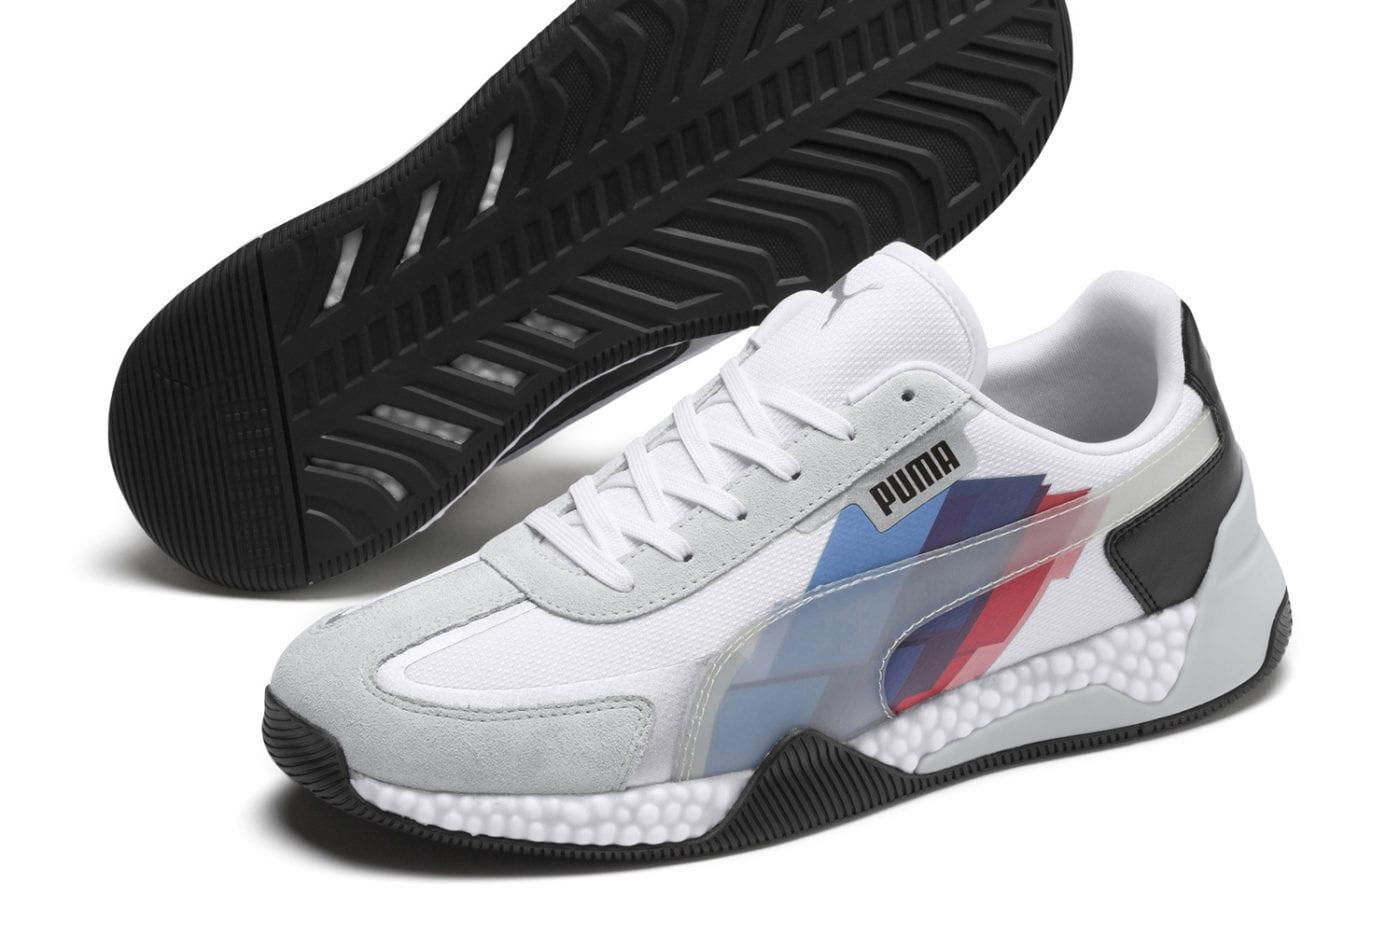 New Puma Motorsport Shoes: Scuderia Ferrari, BMW M and Red